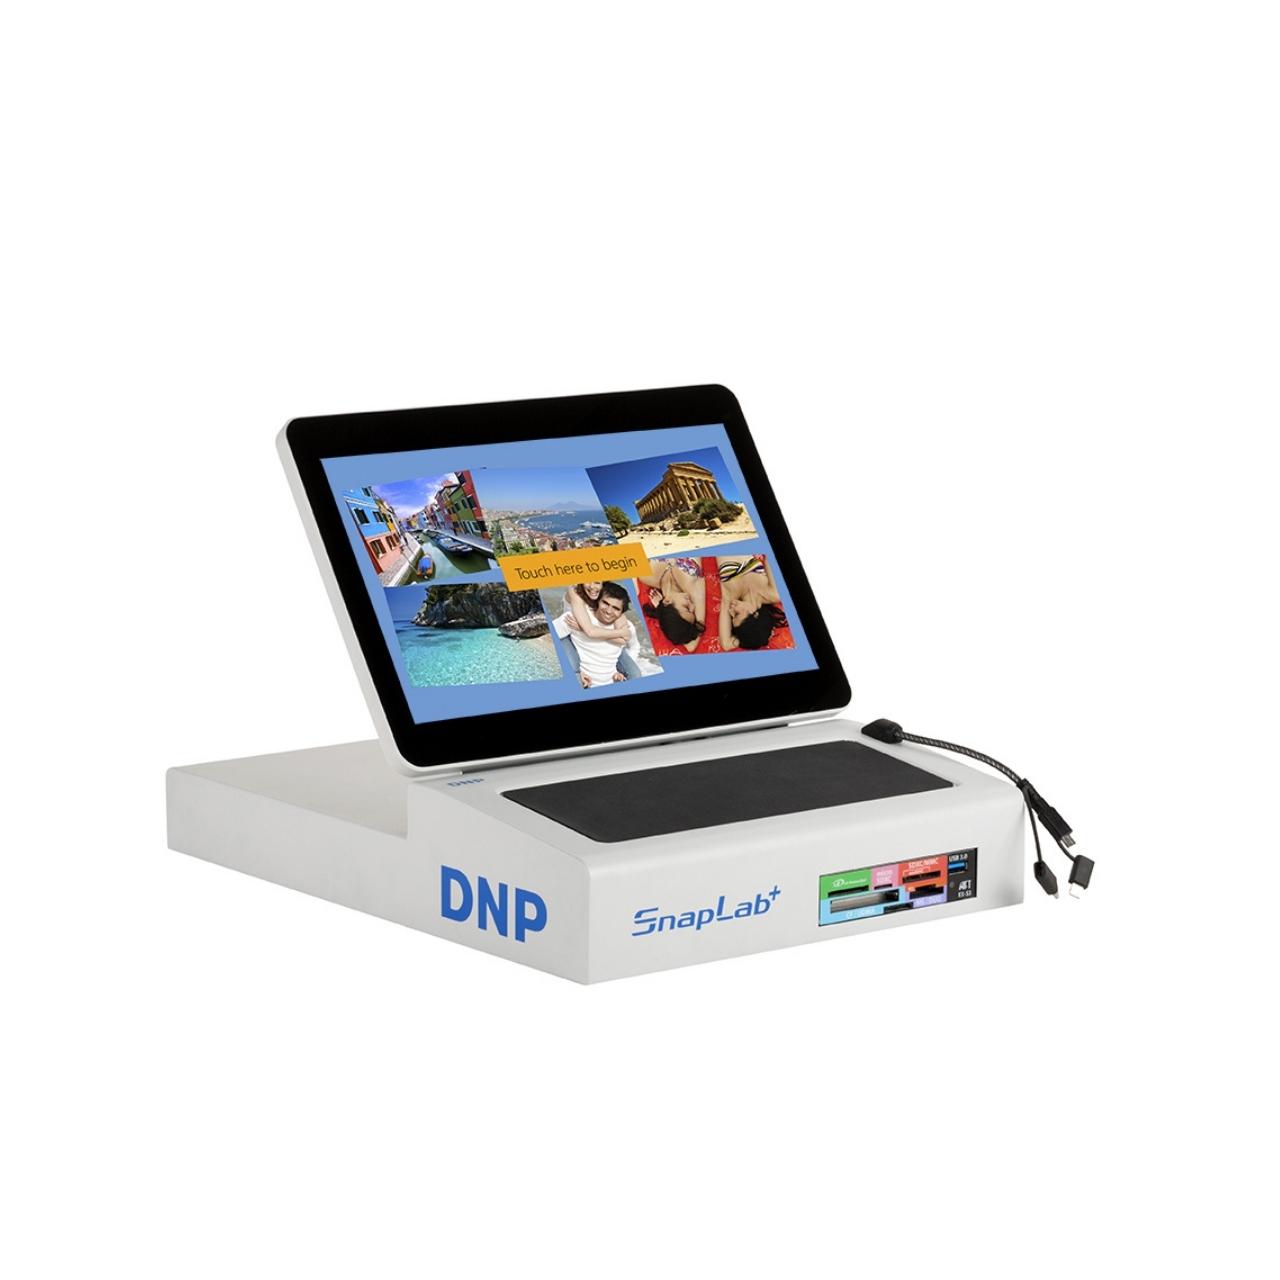 DNP DS-T6 Mini Terminal pedidos